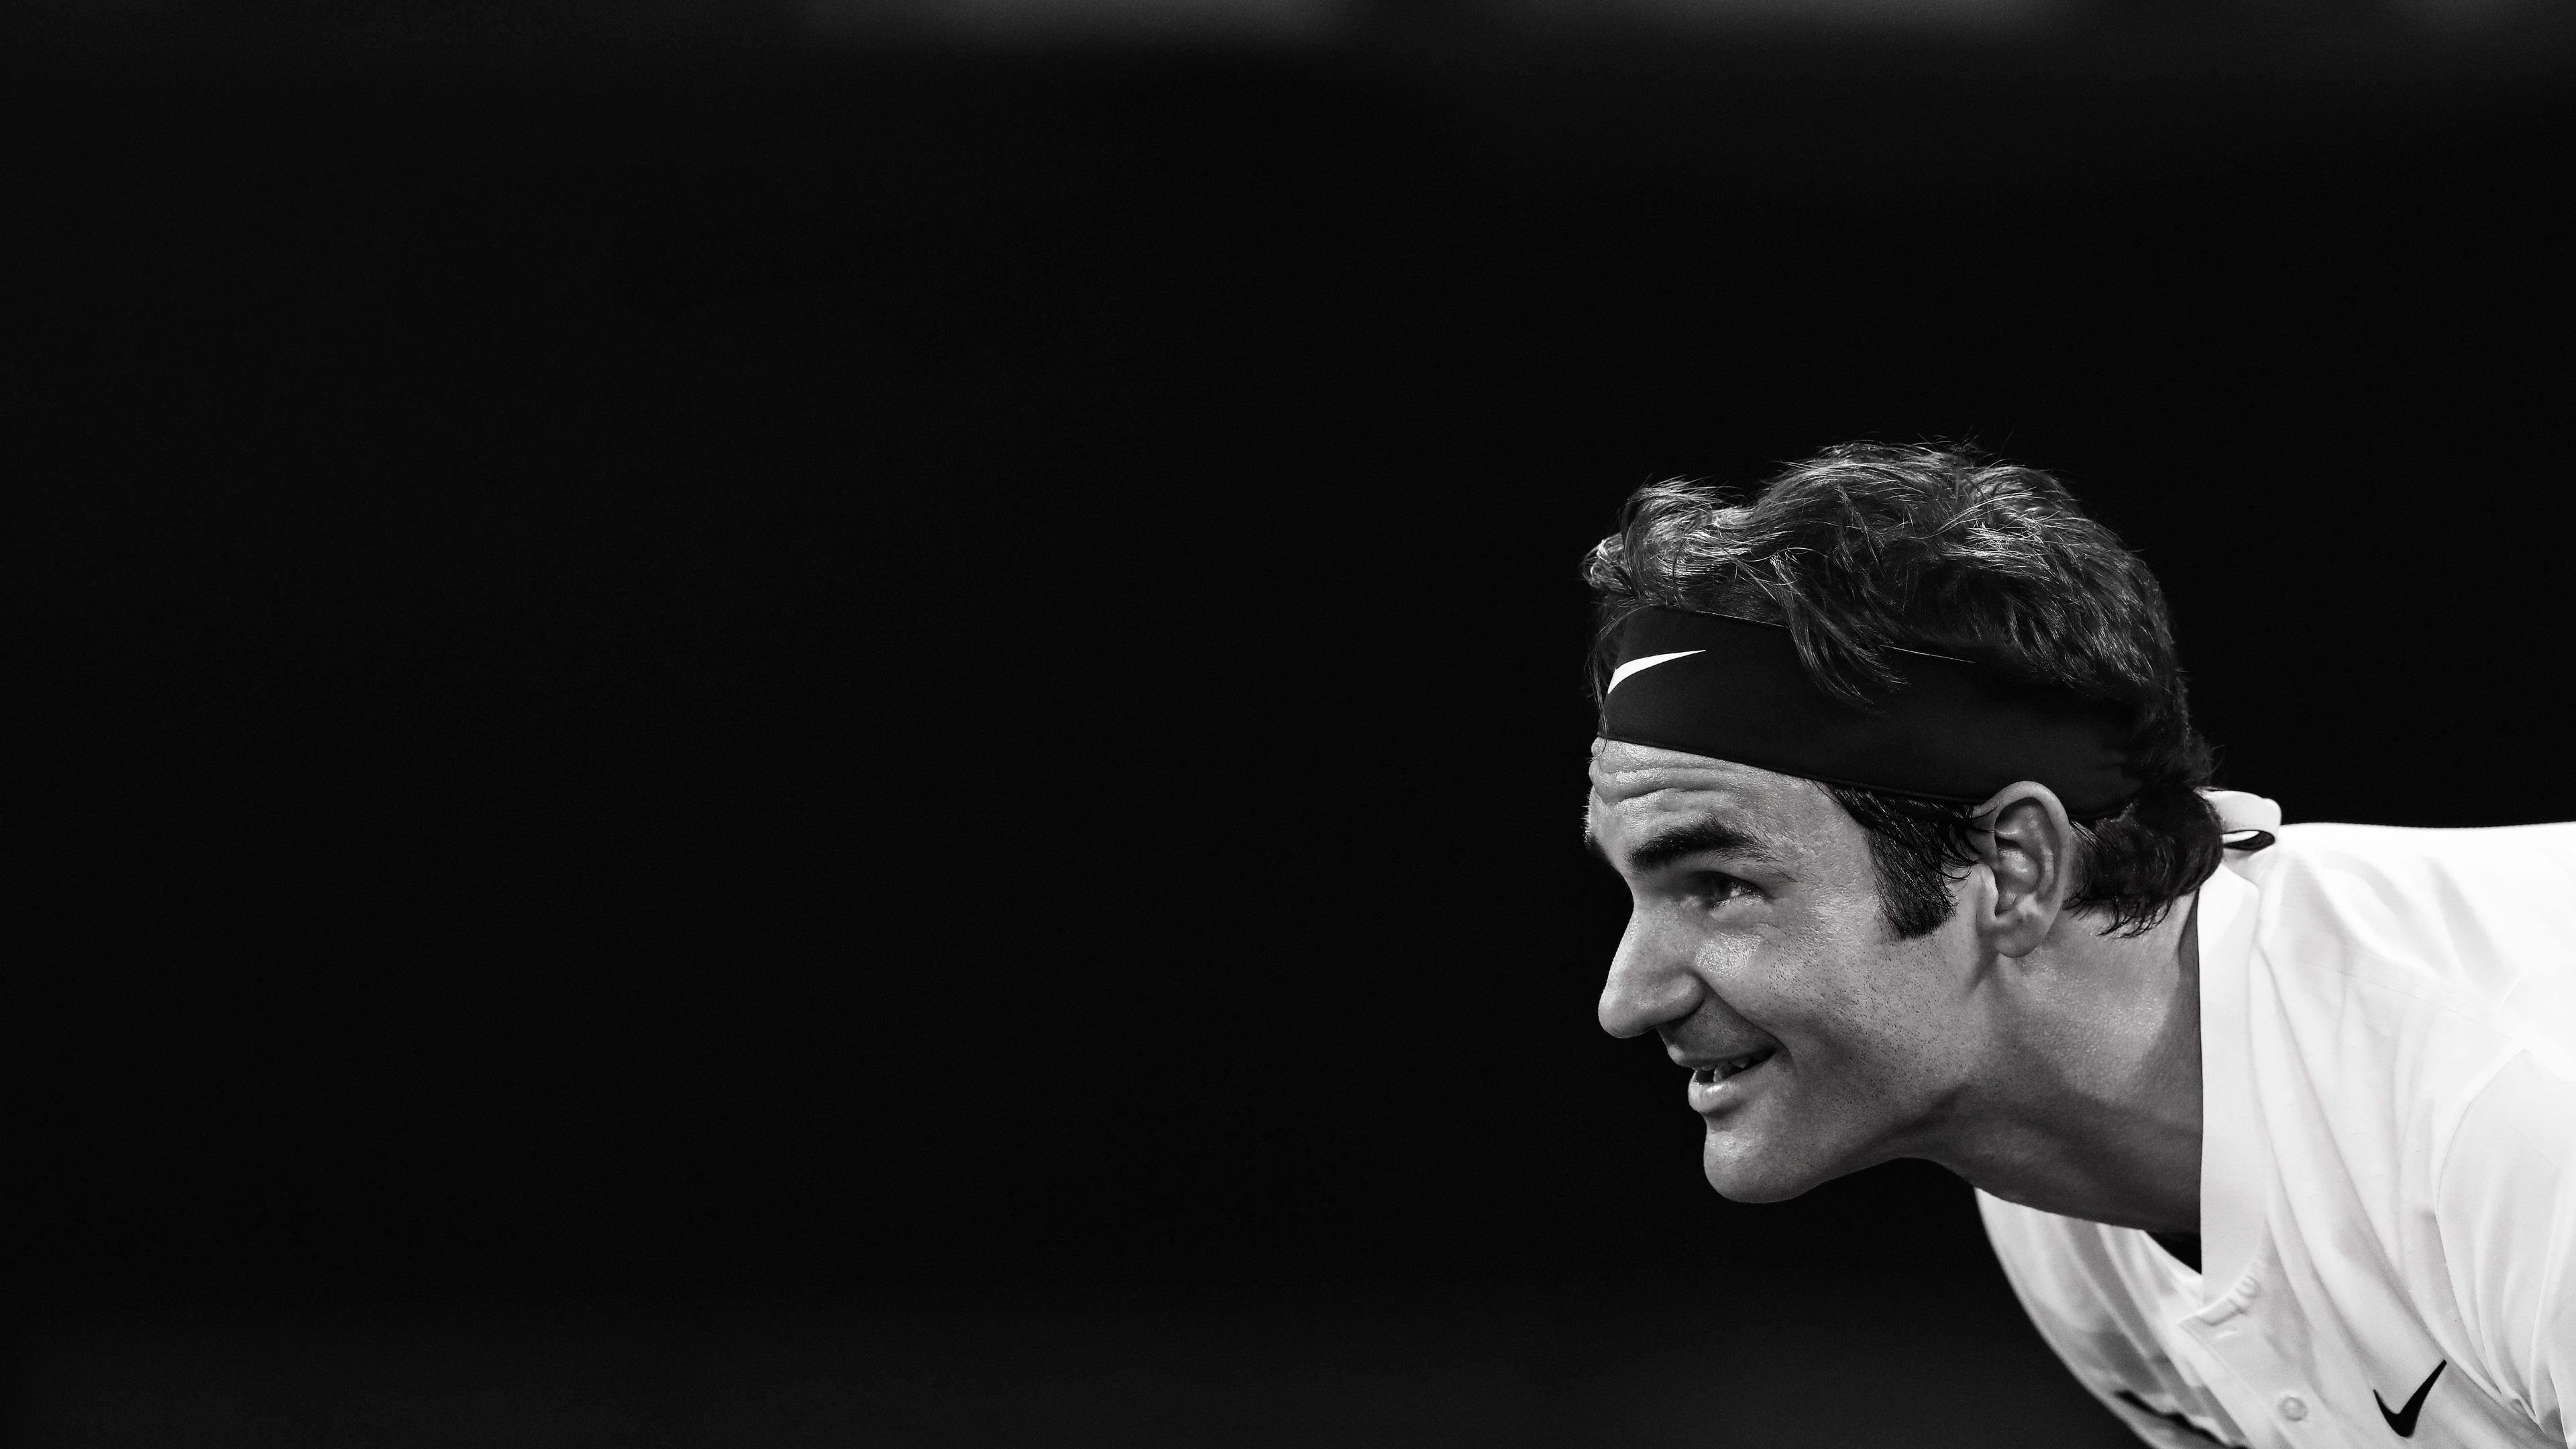 roger federer 5k tennis wallpapers sports wallpapers